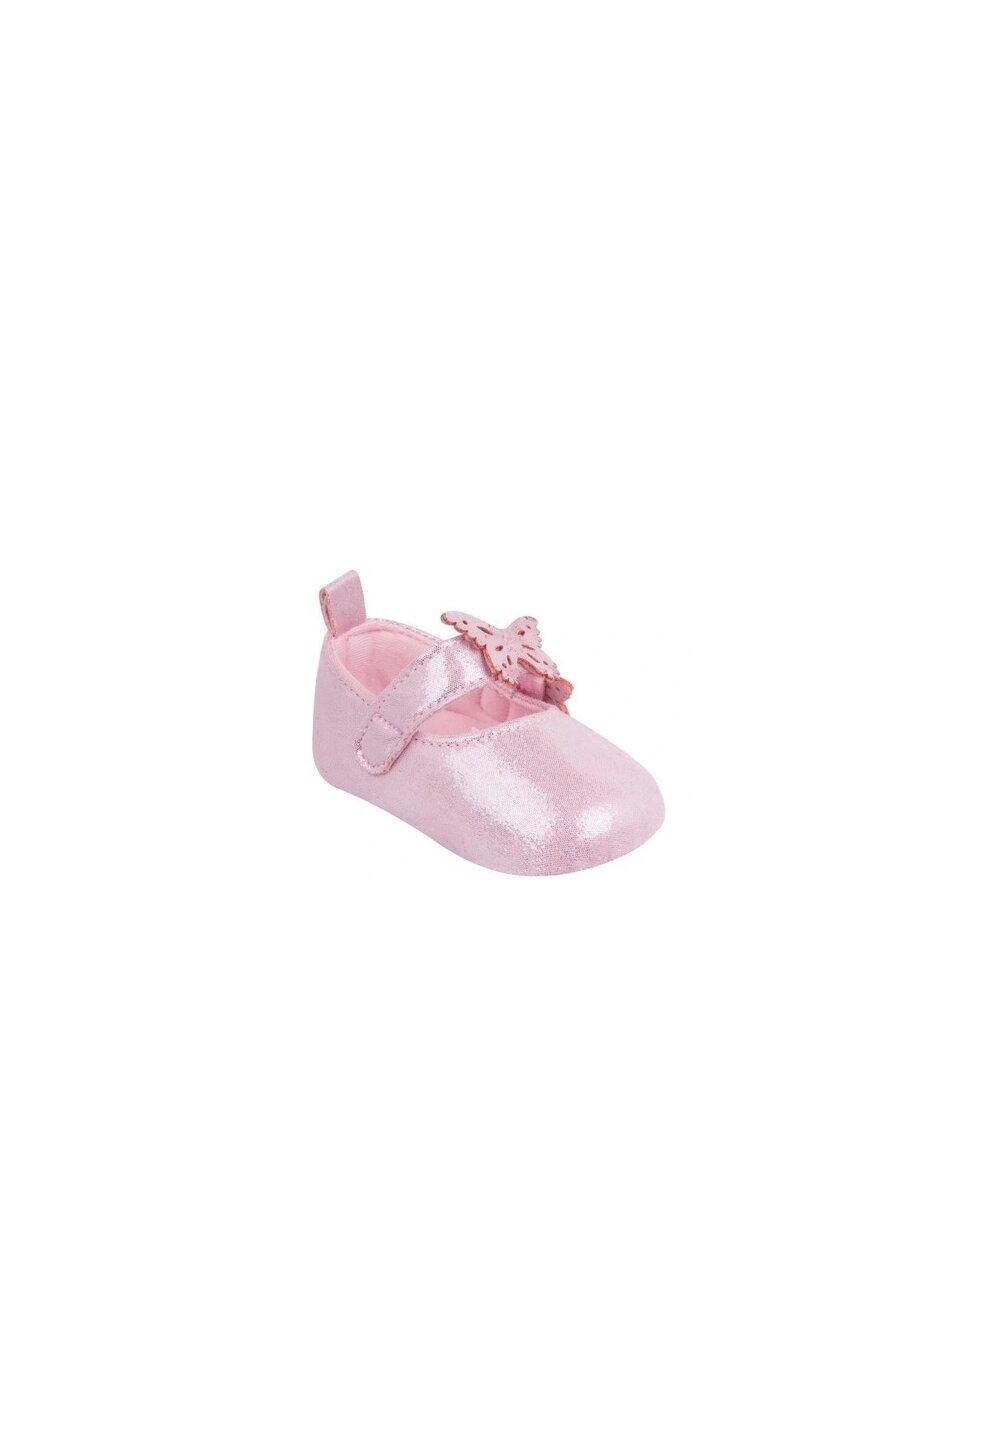 Papucei bebe, roz cu fluturasi imagine